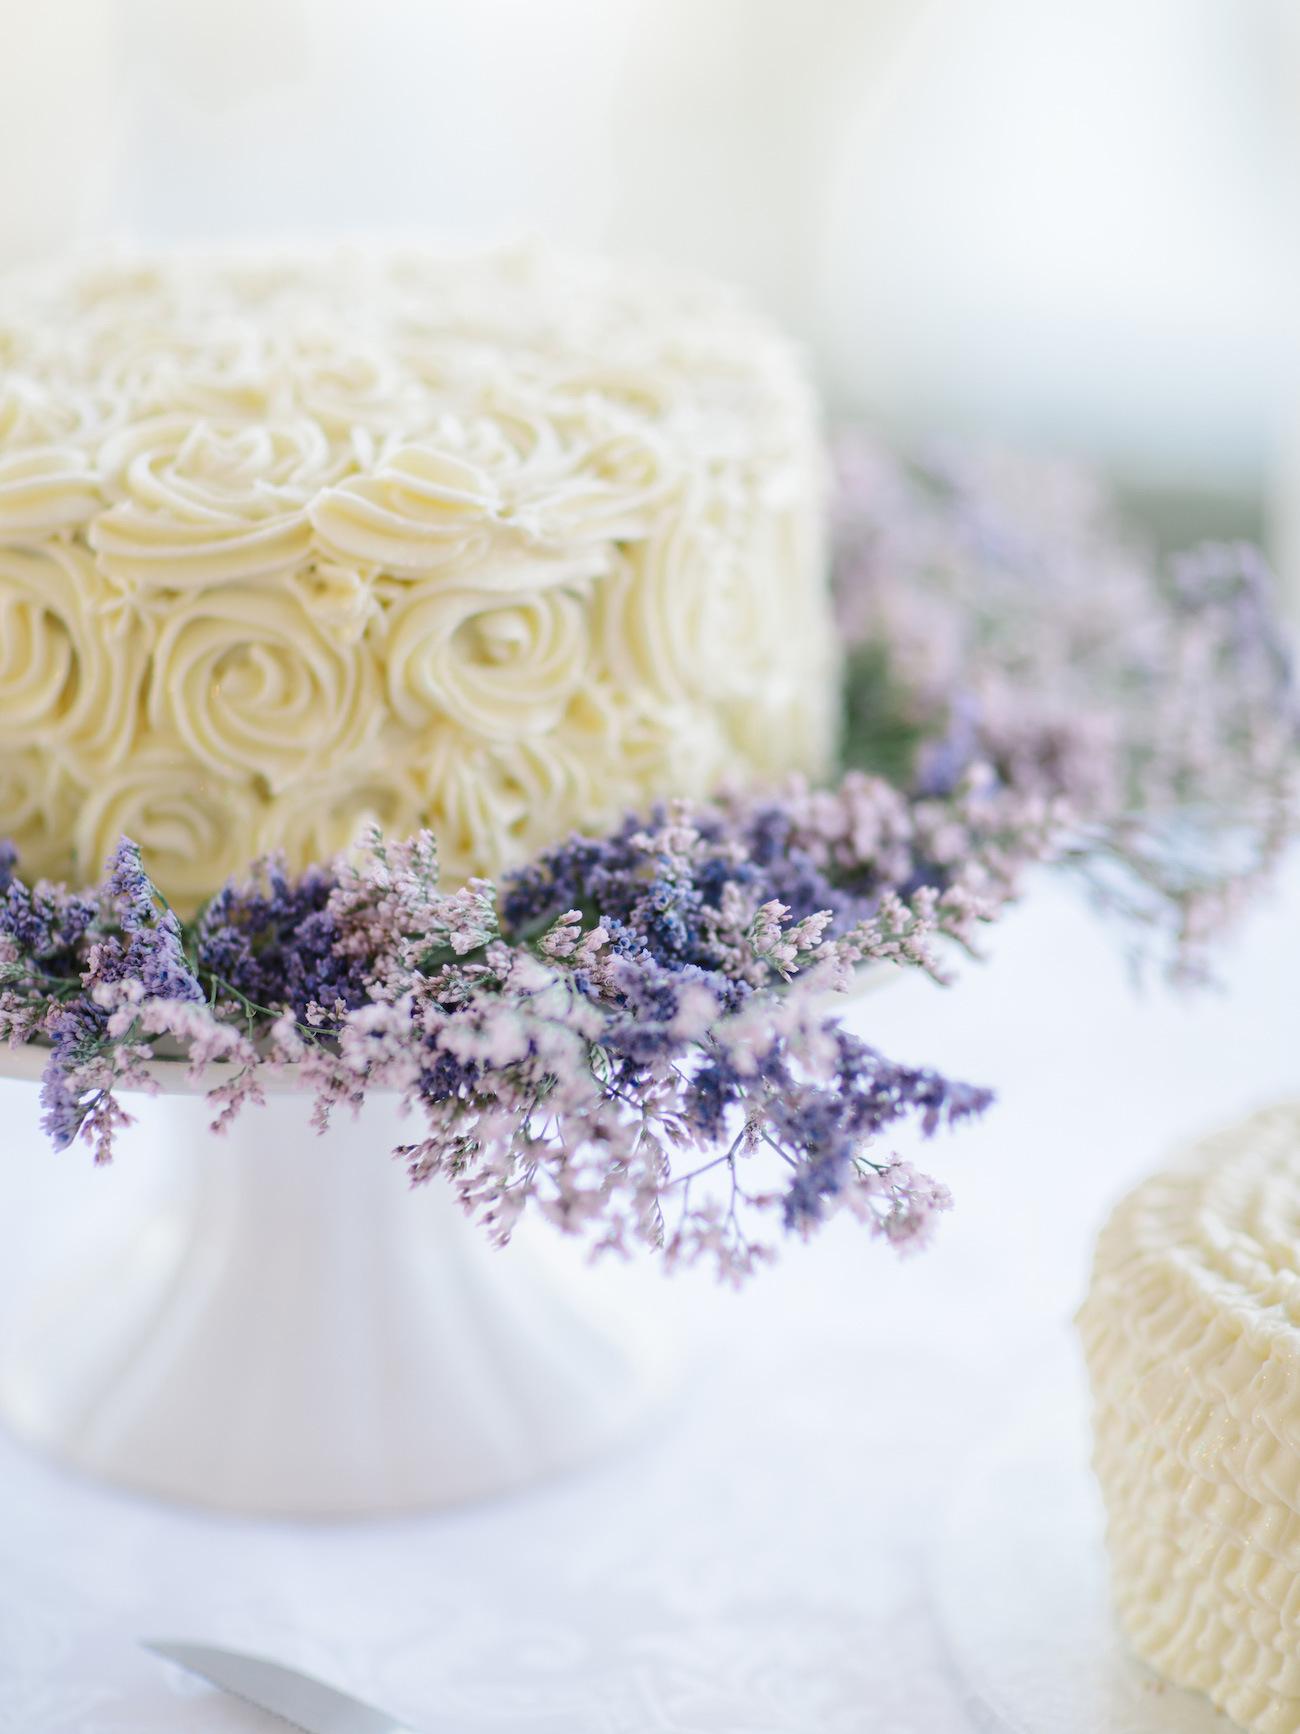 Buttercream Wedding Cake with Heather | Image: Rensche Mari